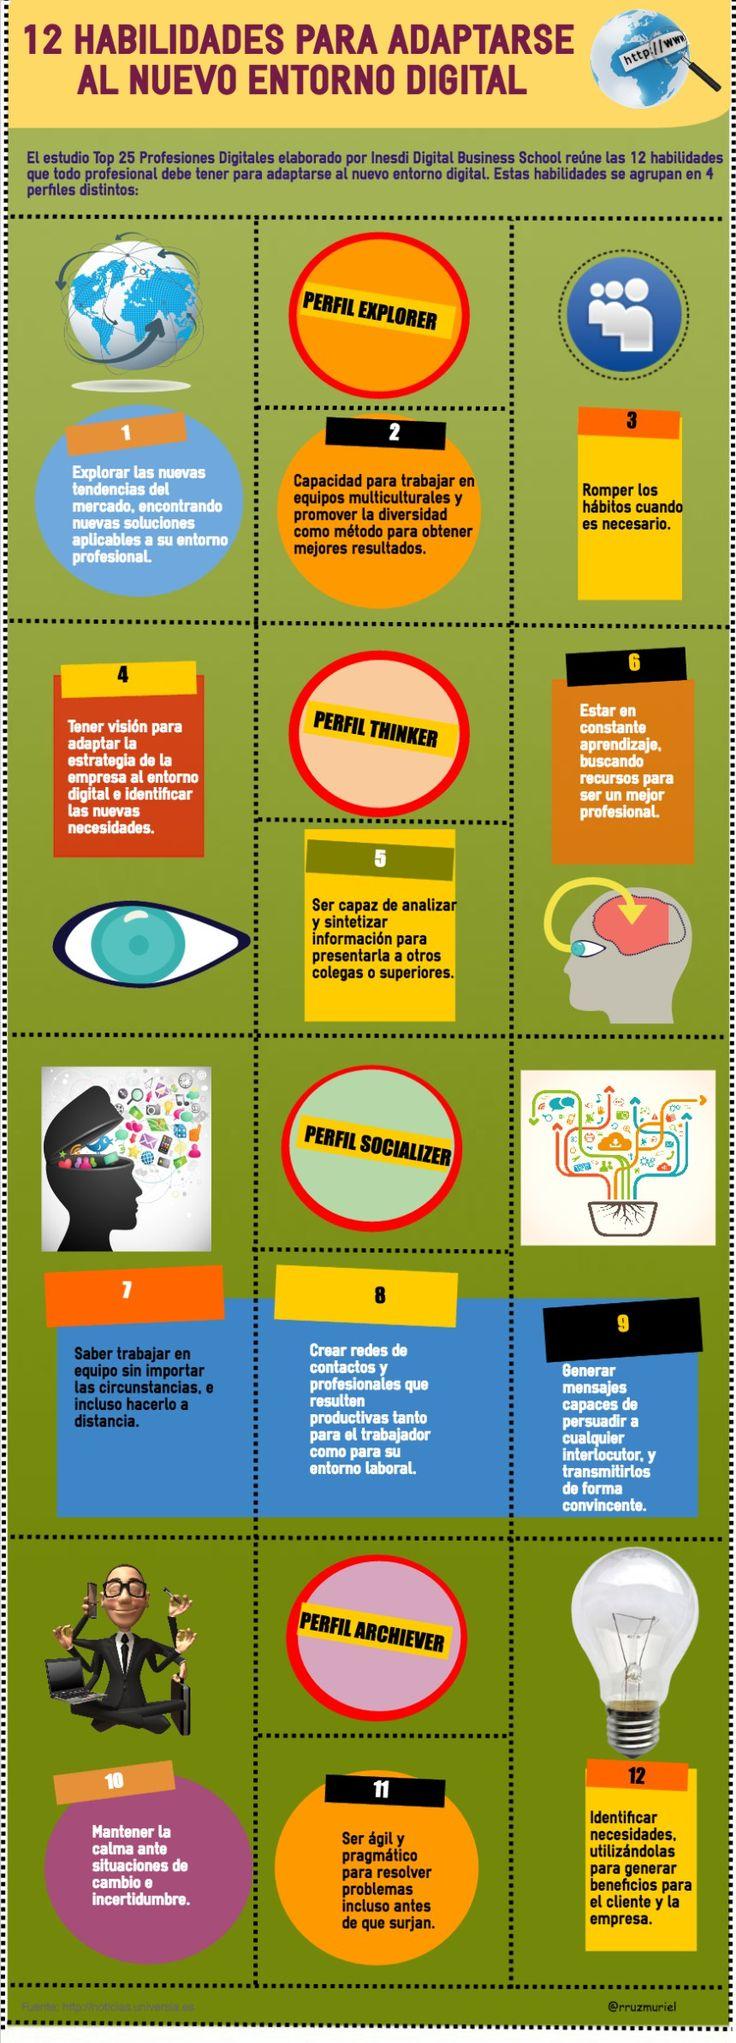 12 habilidades para adaptarse al entono digital #infografia